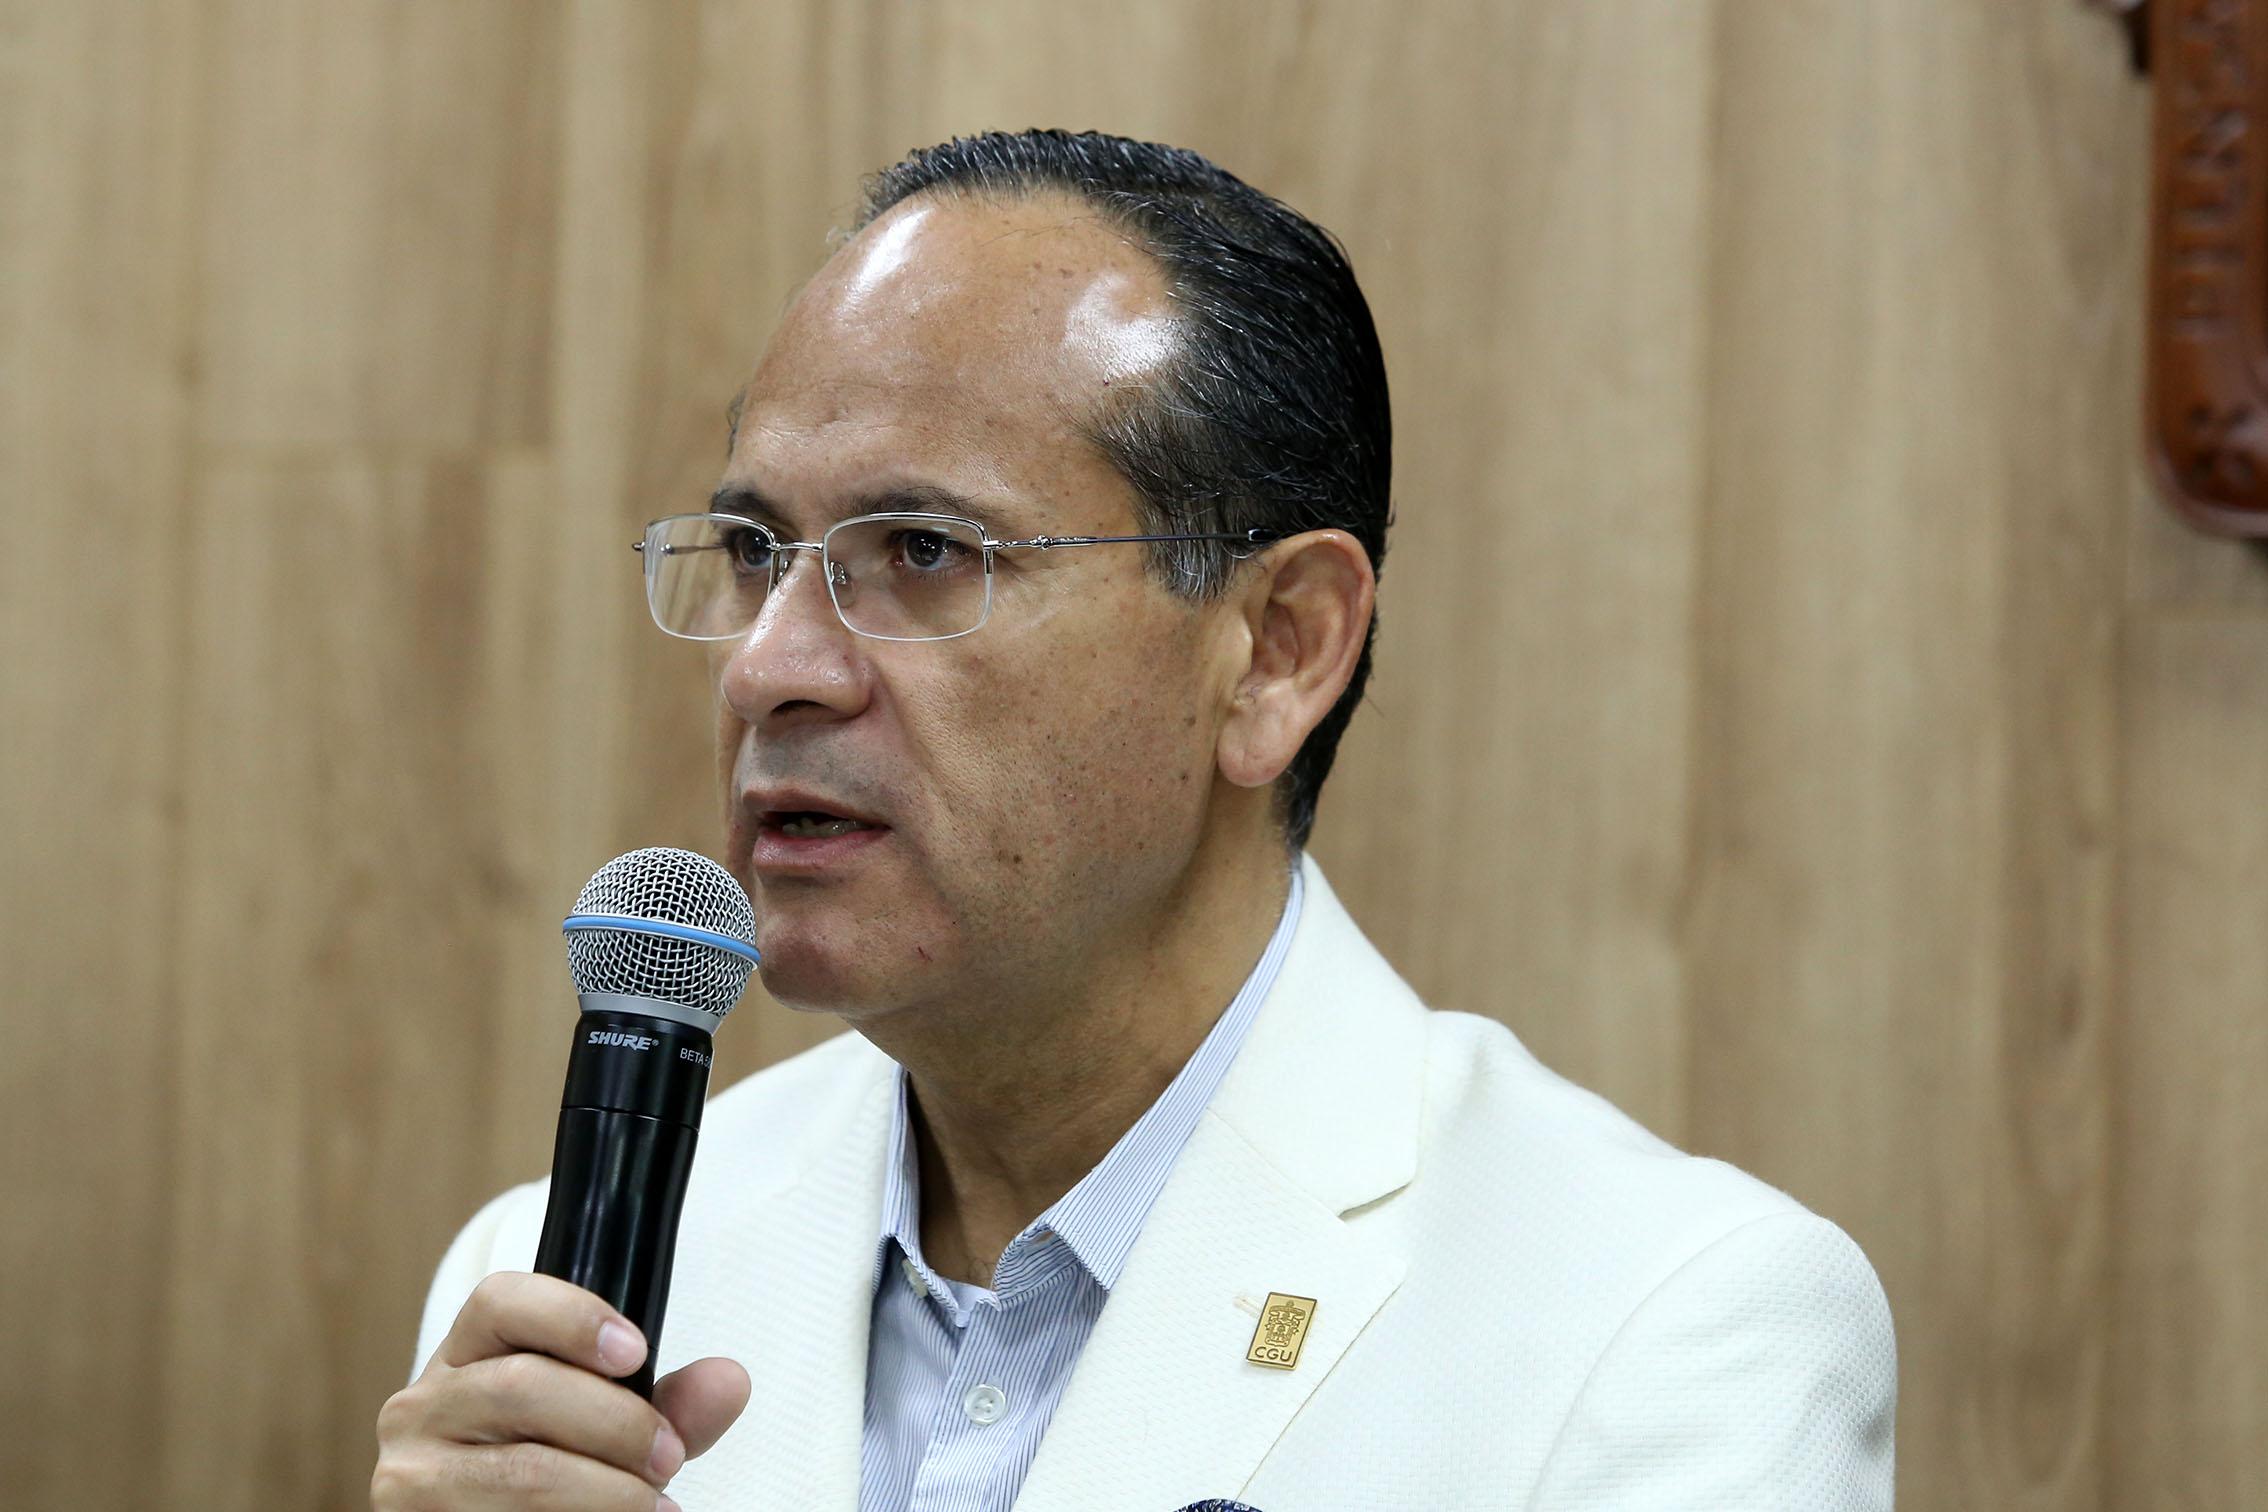 El doctor Héctor Raúl Pérez Gómez es Director del  Hospital Civil de Guadalajara